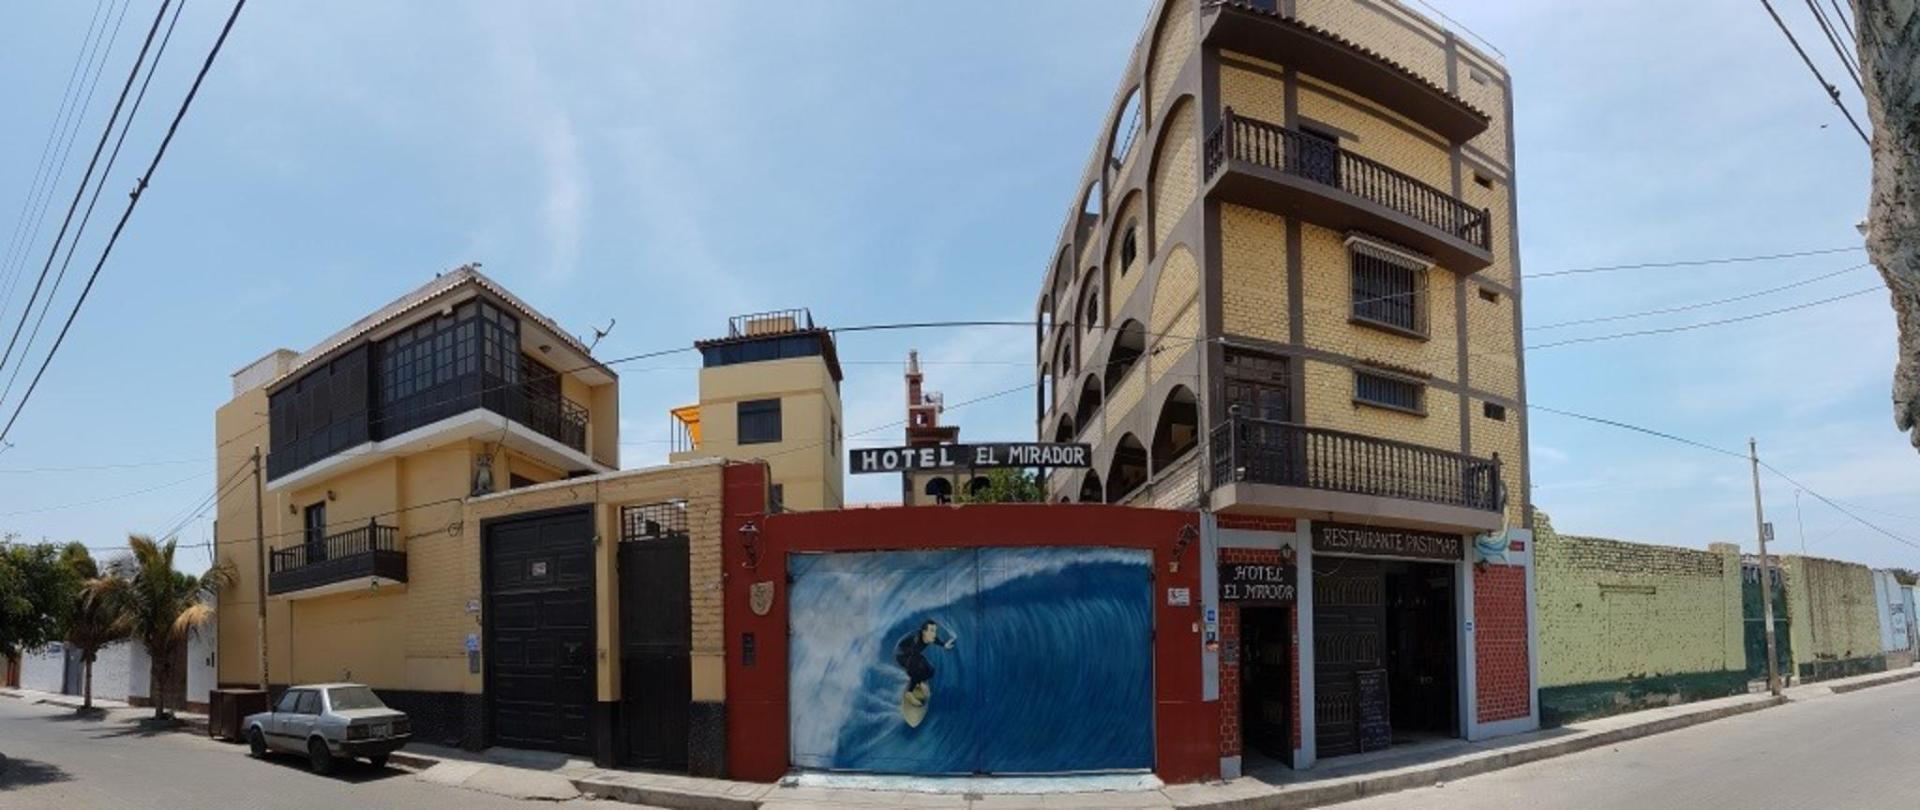 Kite-surf, wind-surf, surf hospedaje hotel El Mirador Pacasmayo Peru